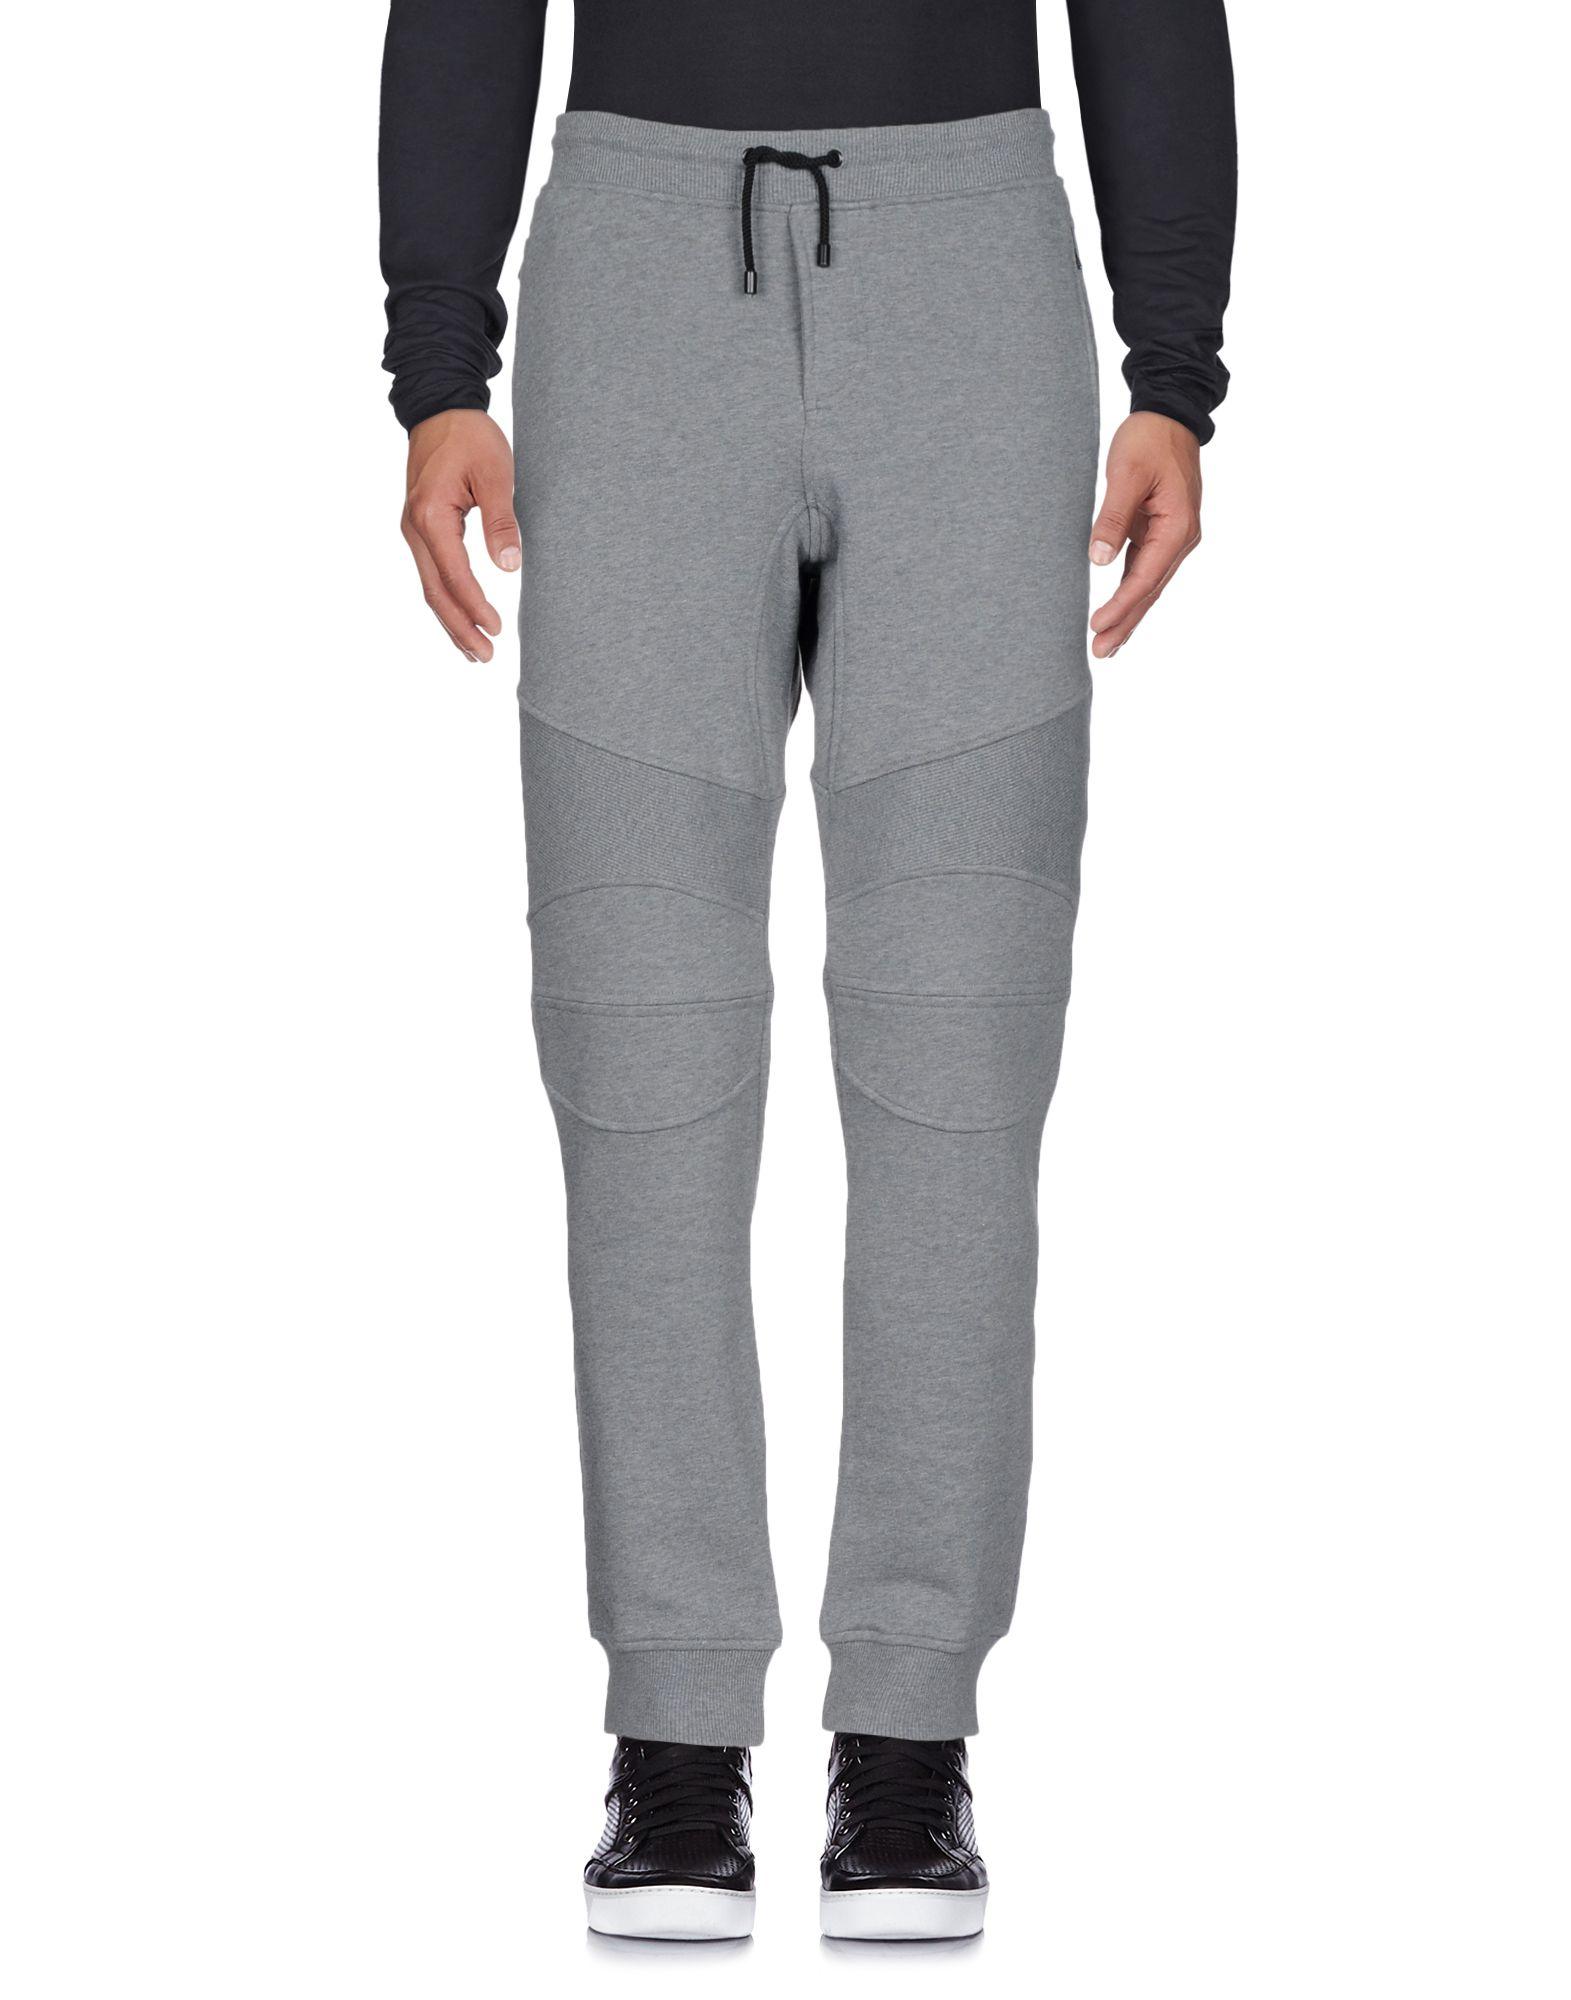 Pantalone Belstaff Donna - Acquista online su